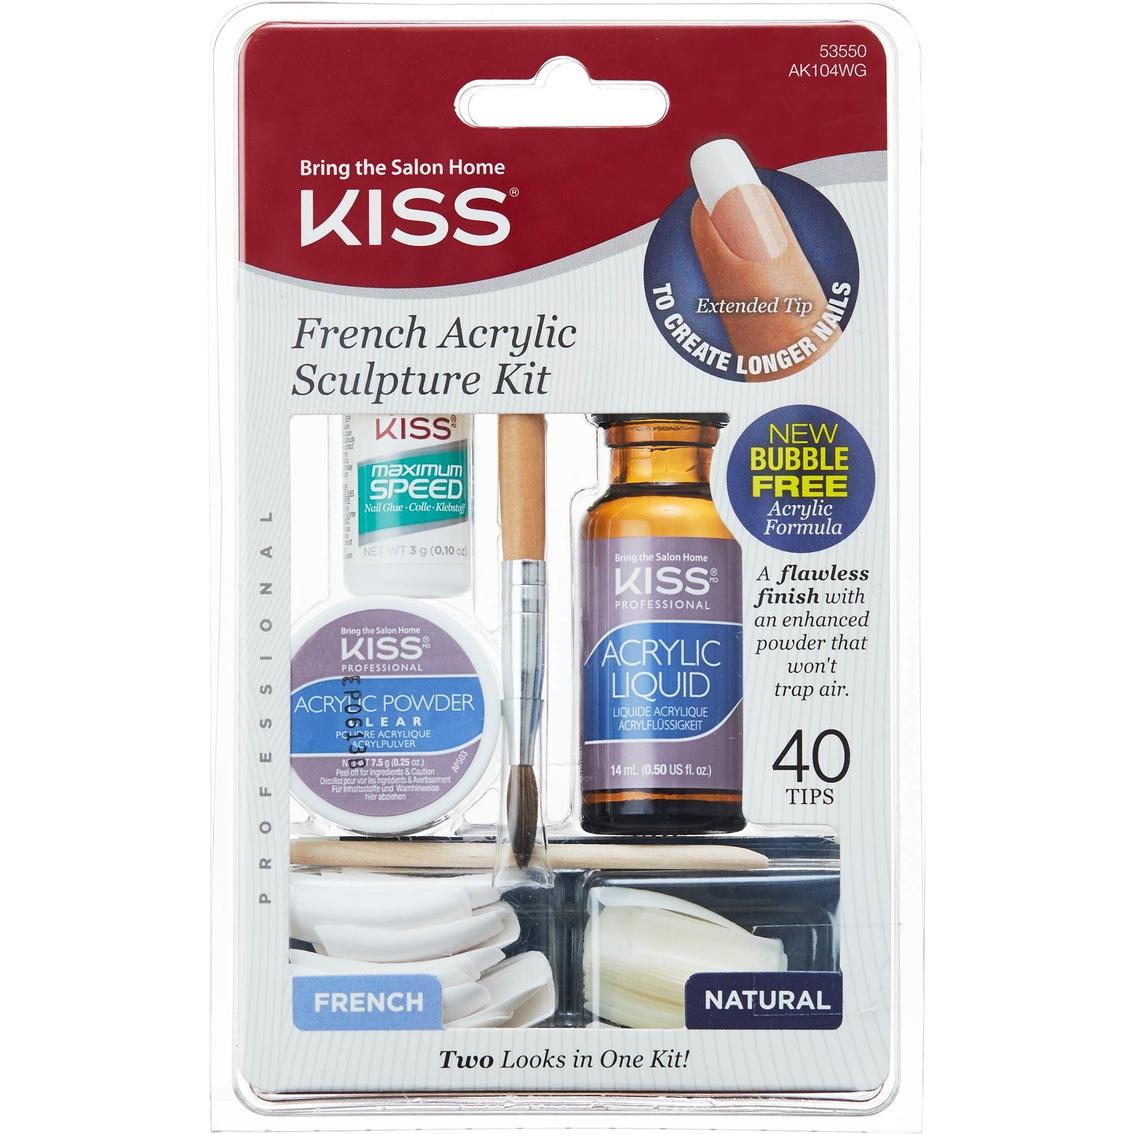 Kiss Acrylic Nail Kit Instructions: Kiss French Acrylic Sculpture Nail Kit